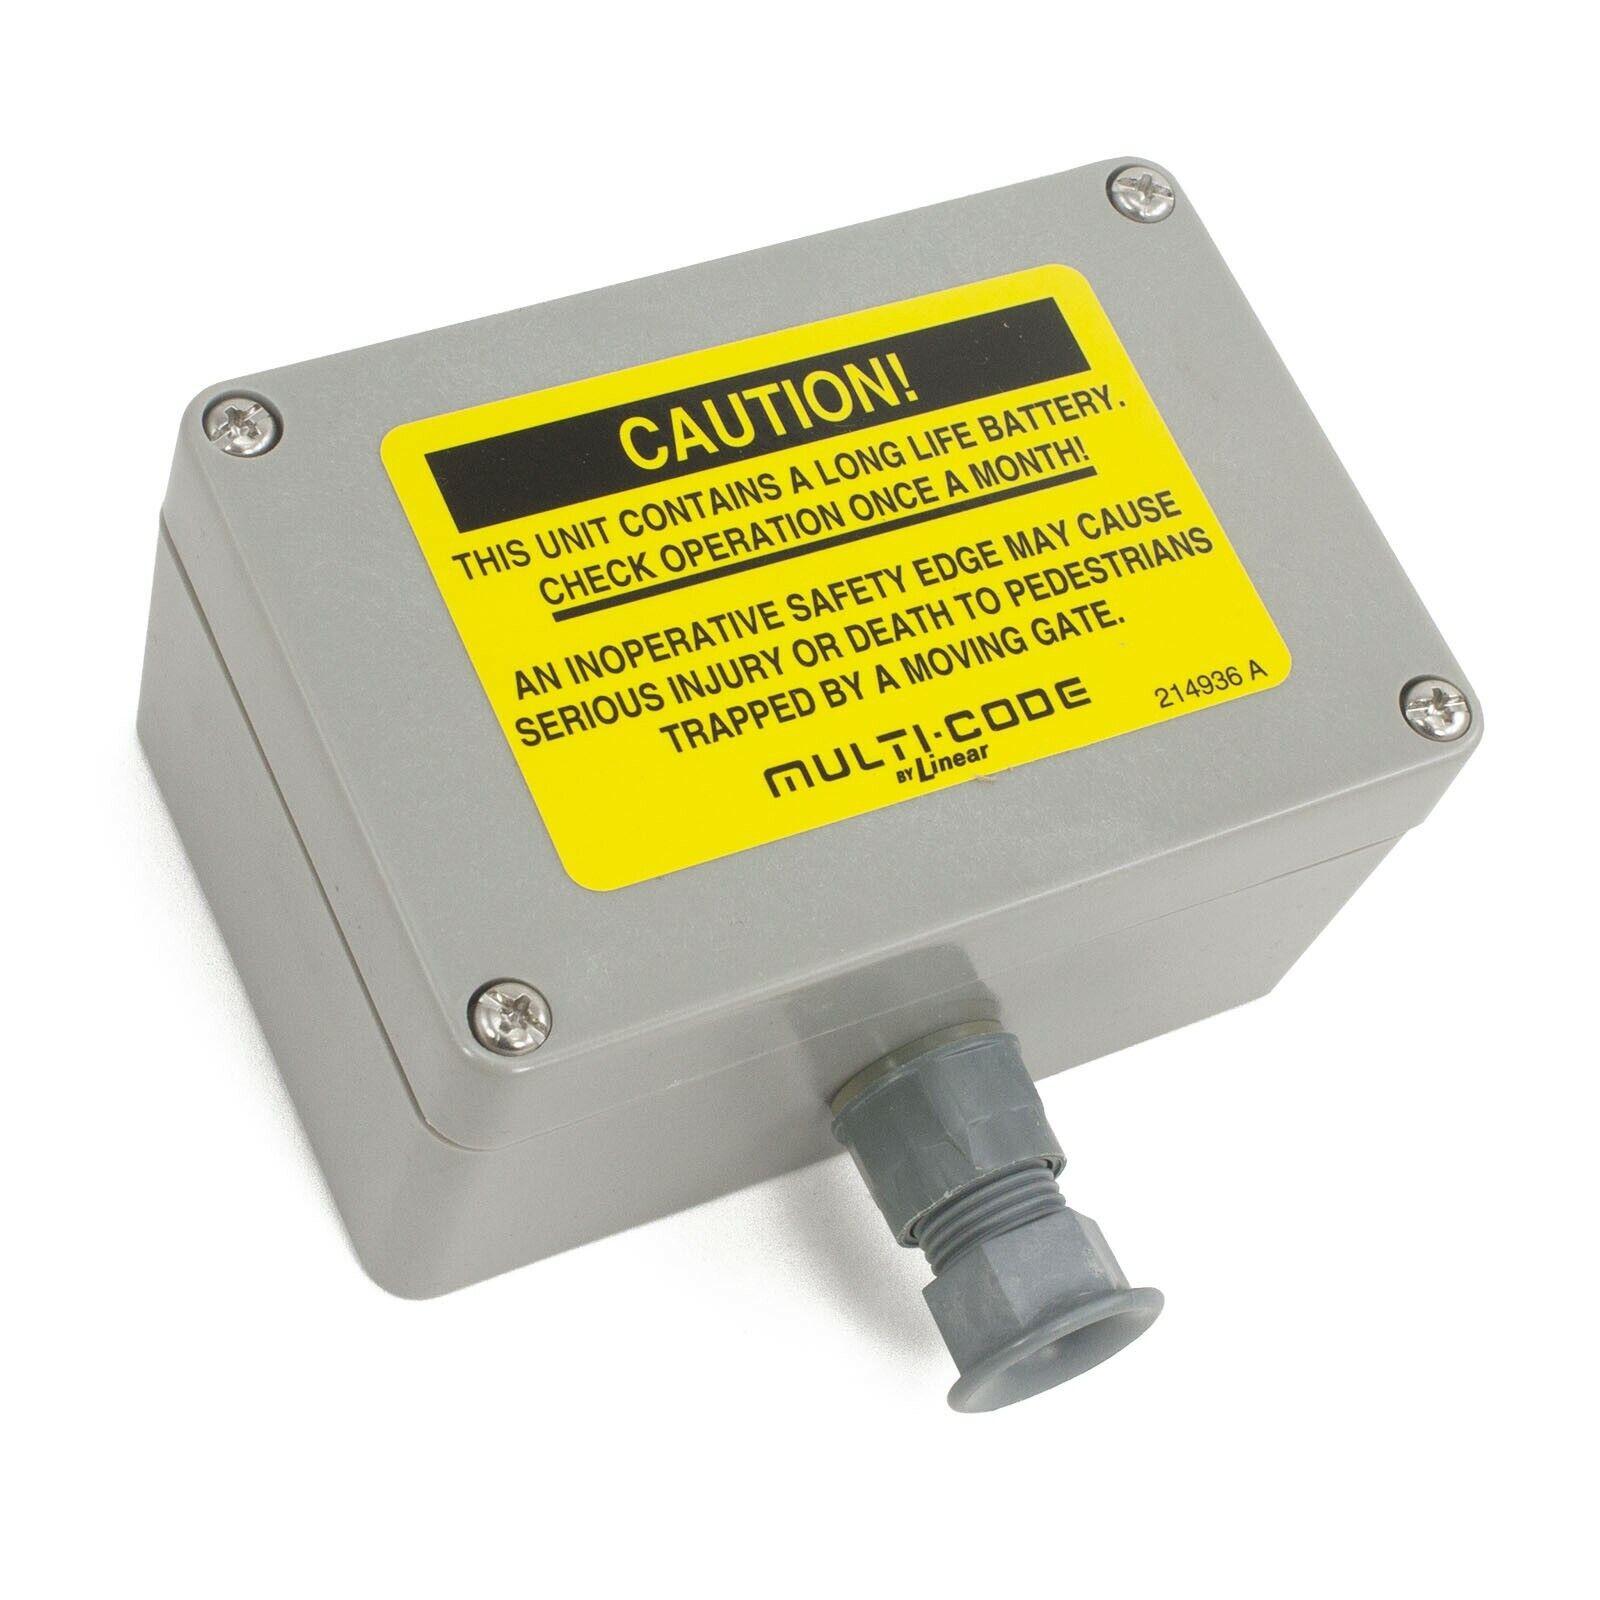 Linear Multi-Code Safety Edge Transmitter 302210 Garage Door Opener MCS302210